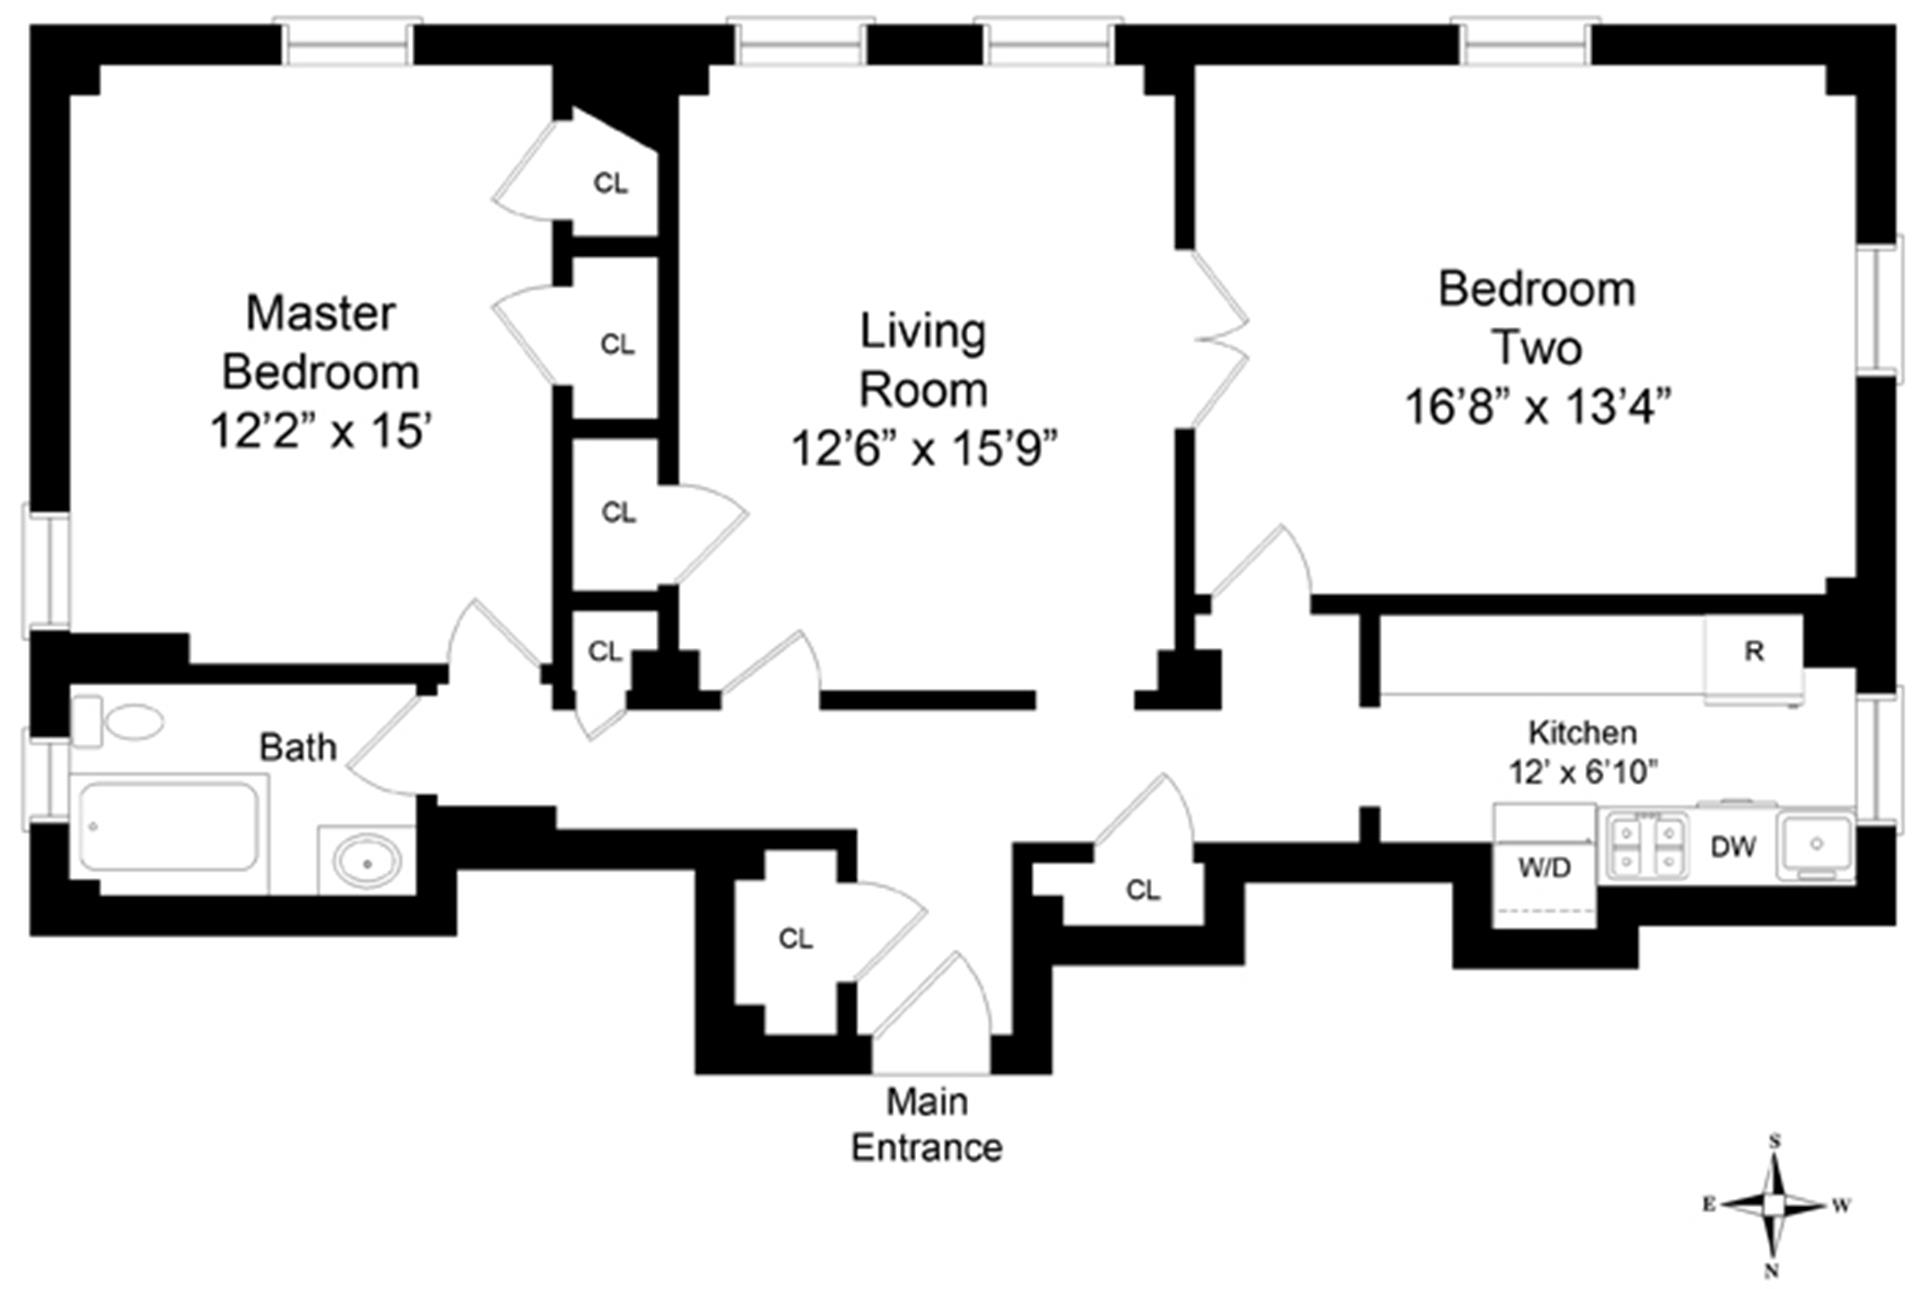 Floor plan of 375 Riverside Drive, 9F - Upper West Side, New York